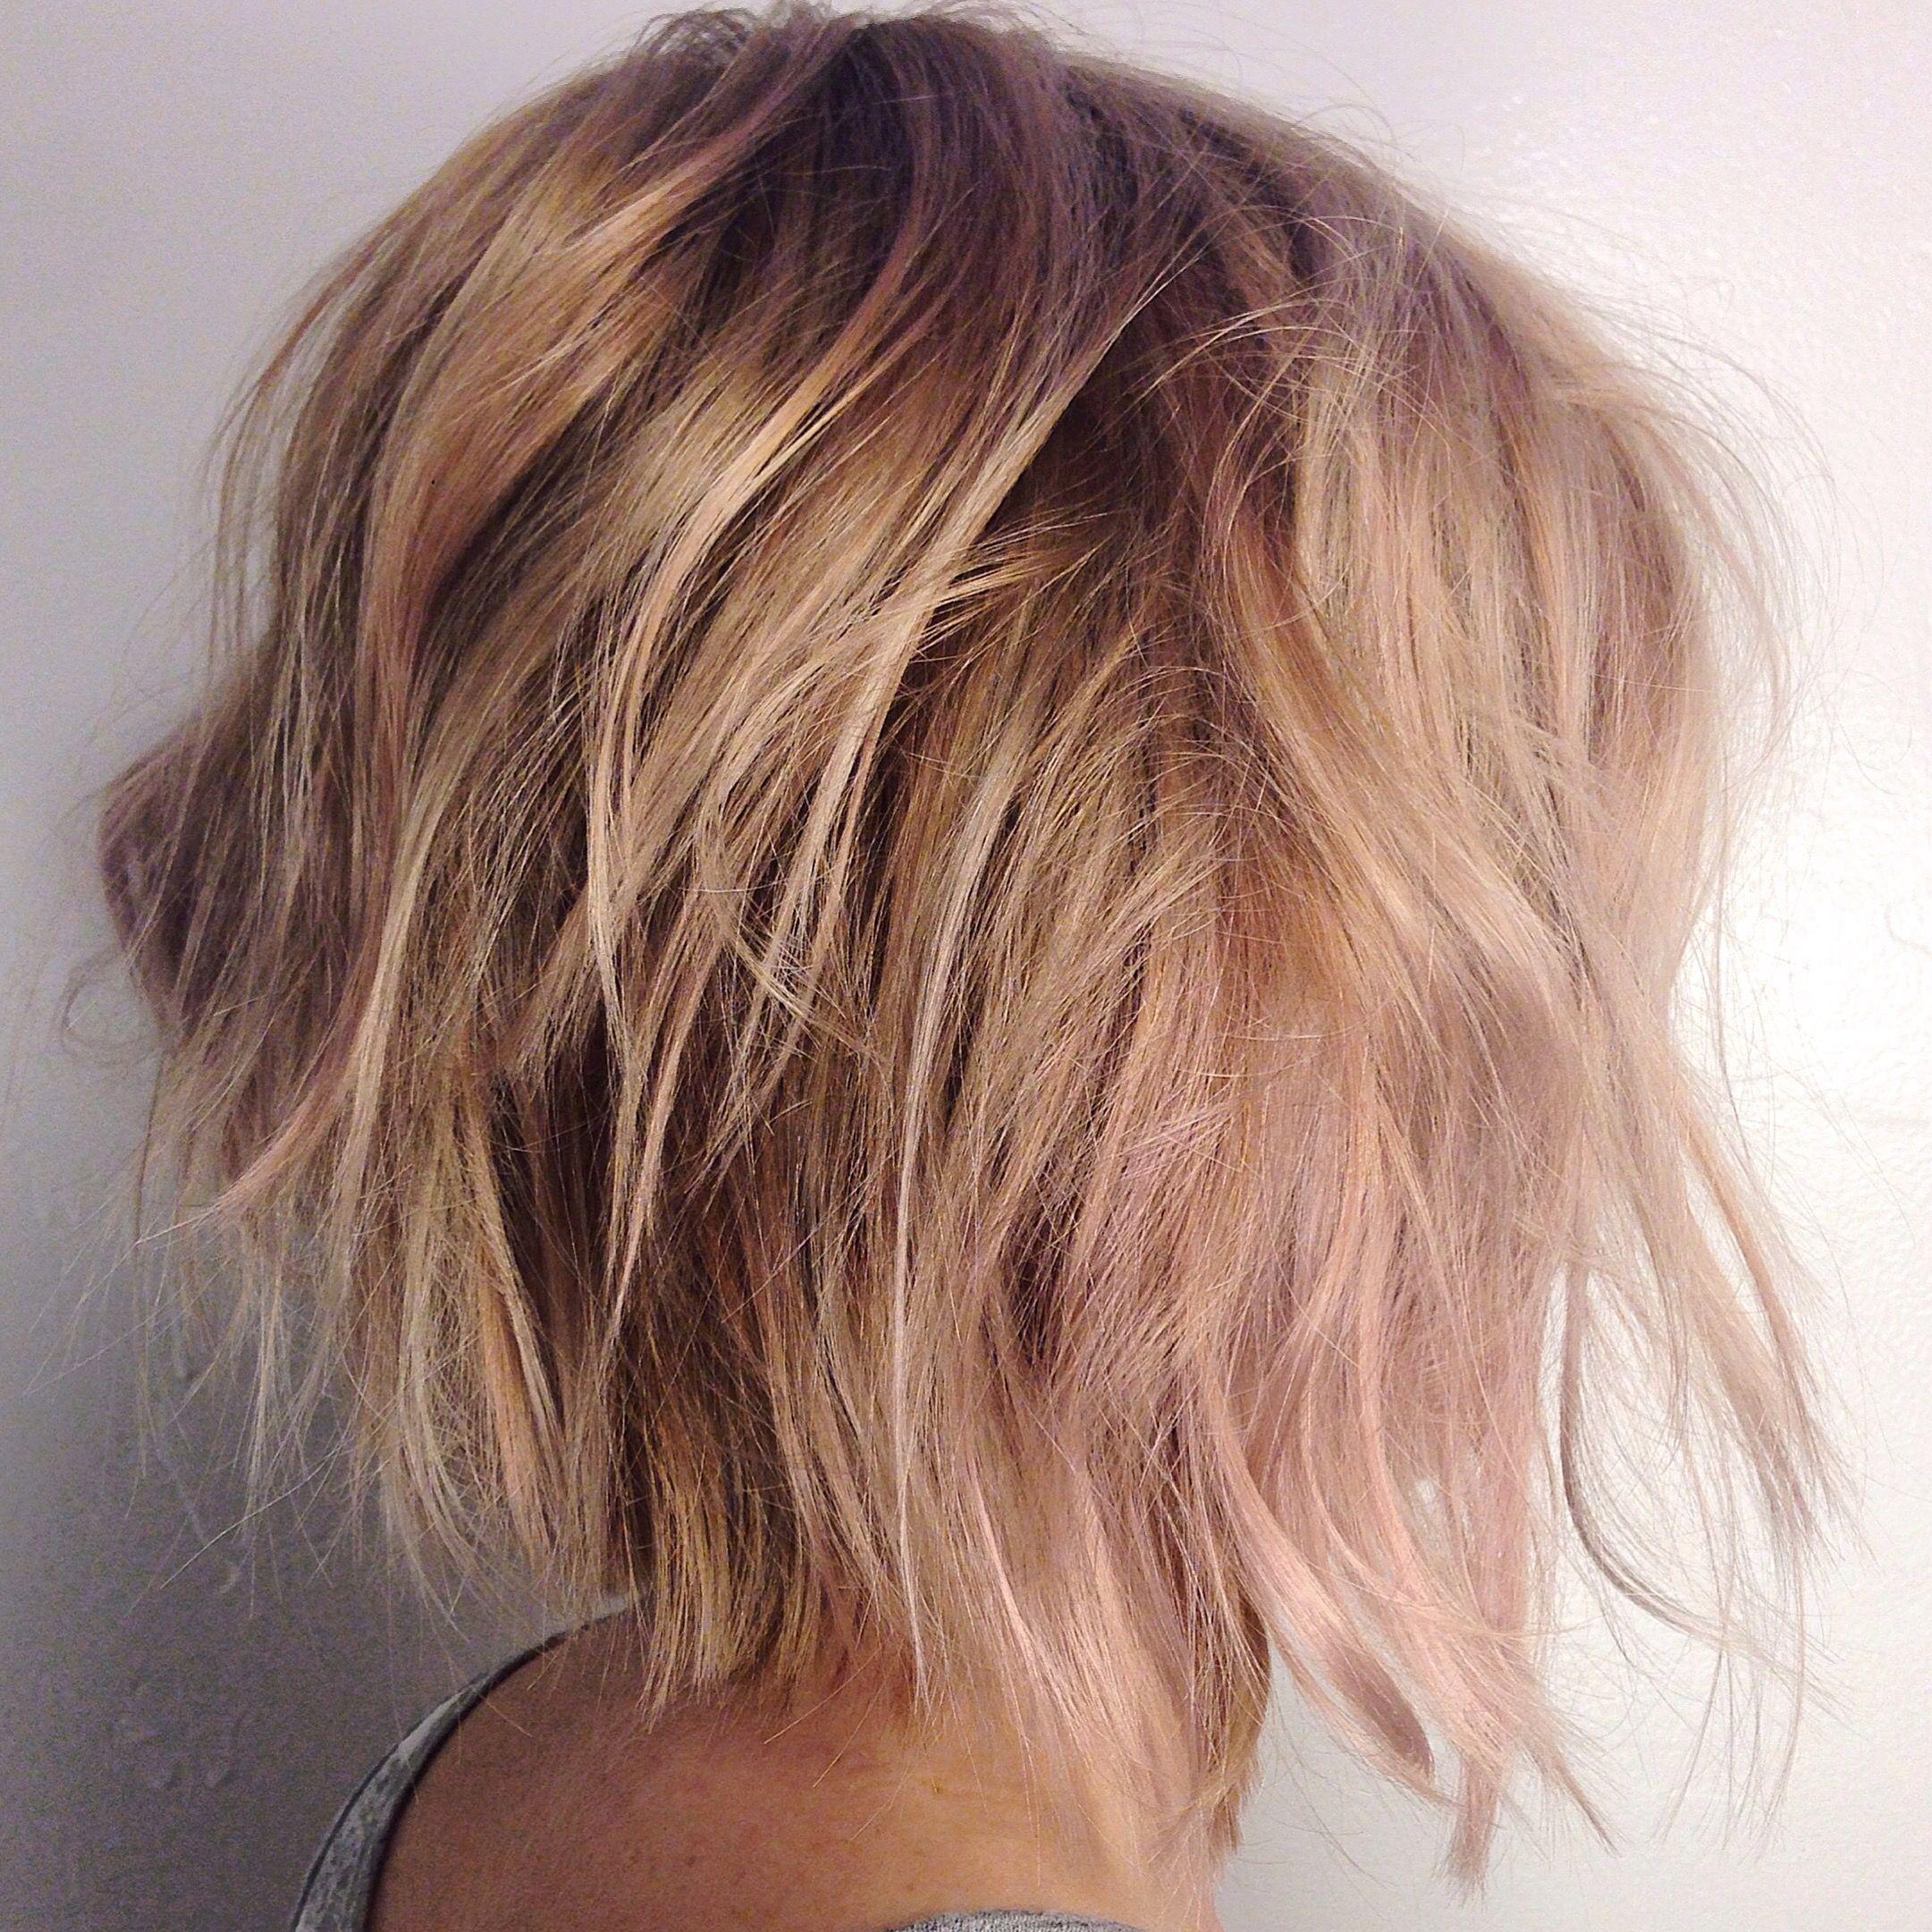 Drelefevre Com Messy Bob Hairstyles Hair Styles Messy Hairstyles